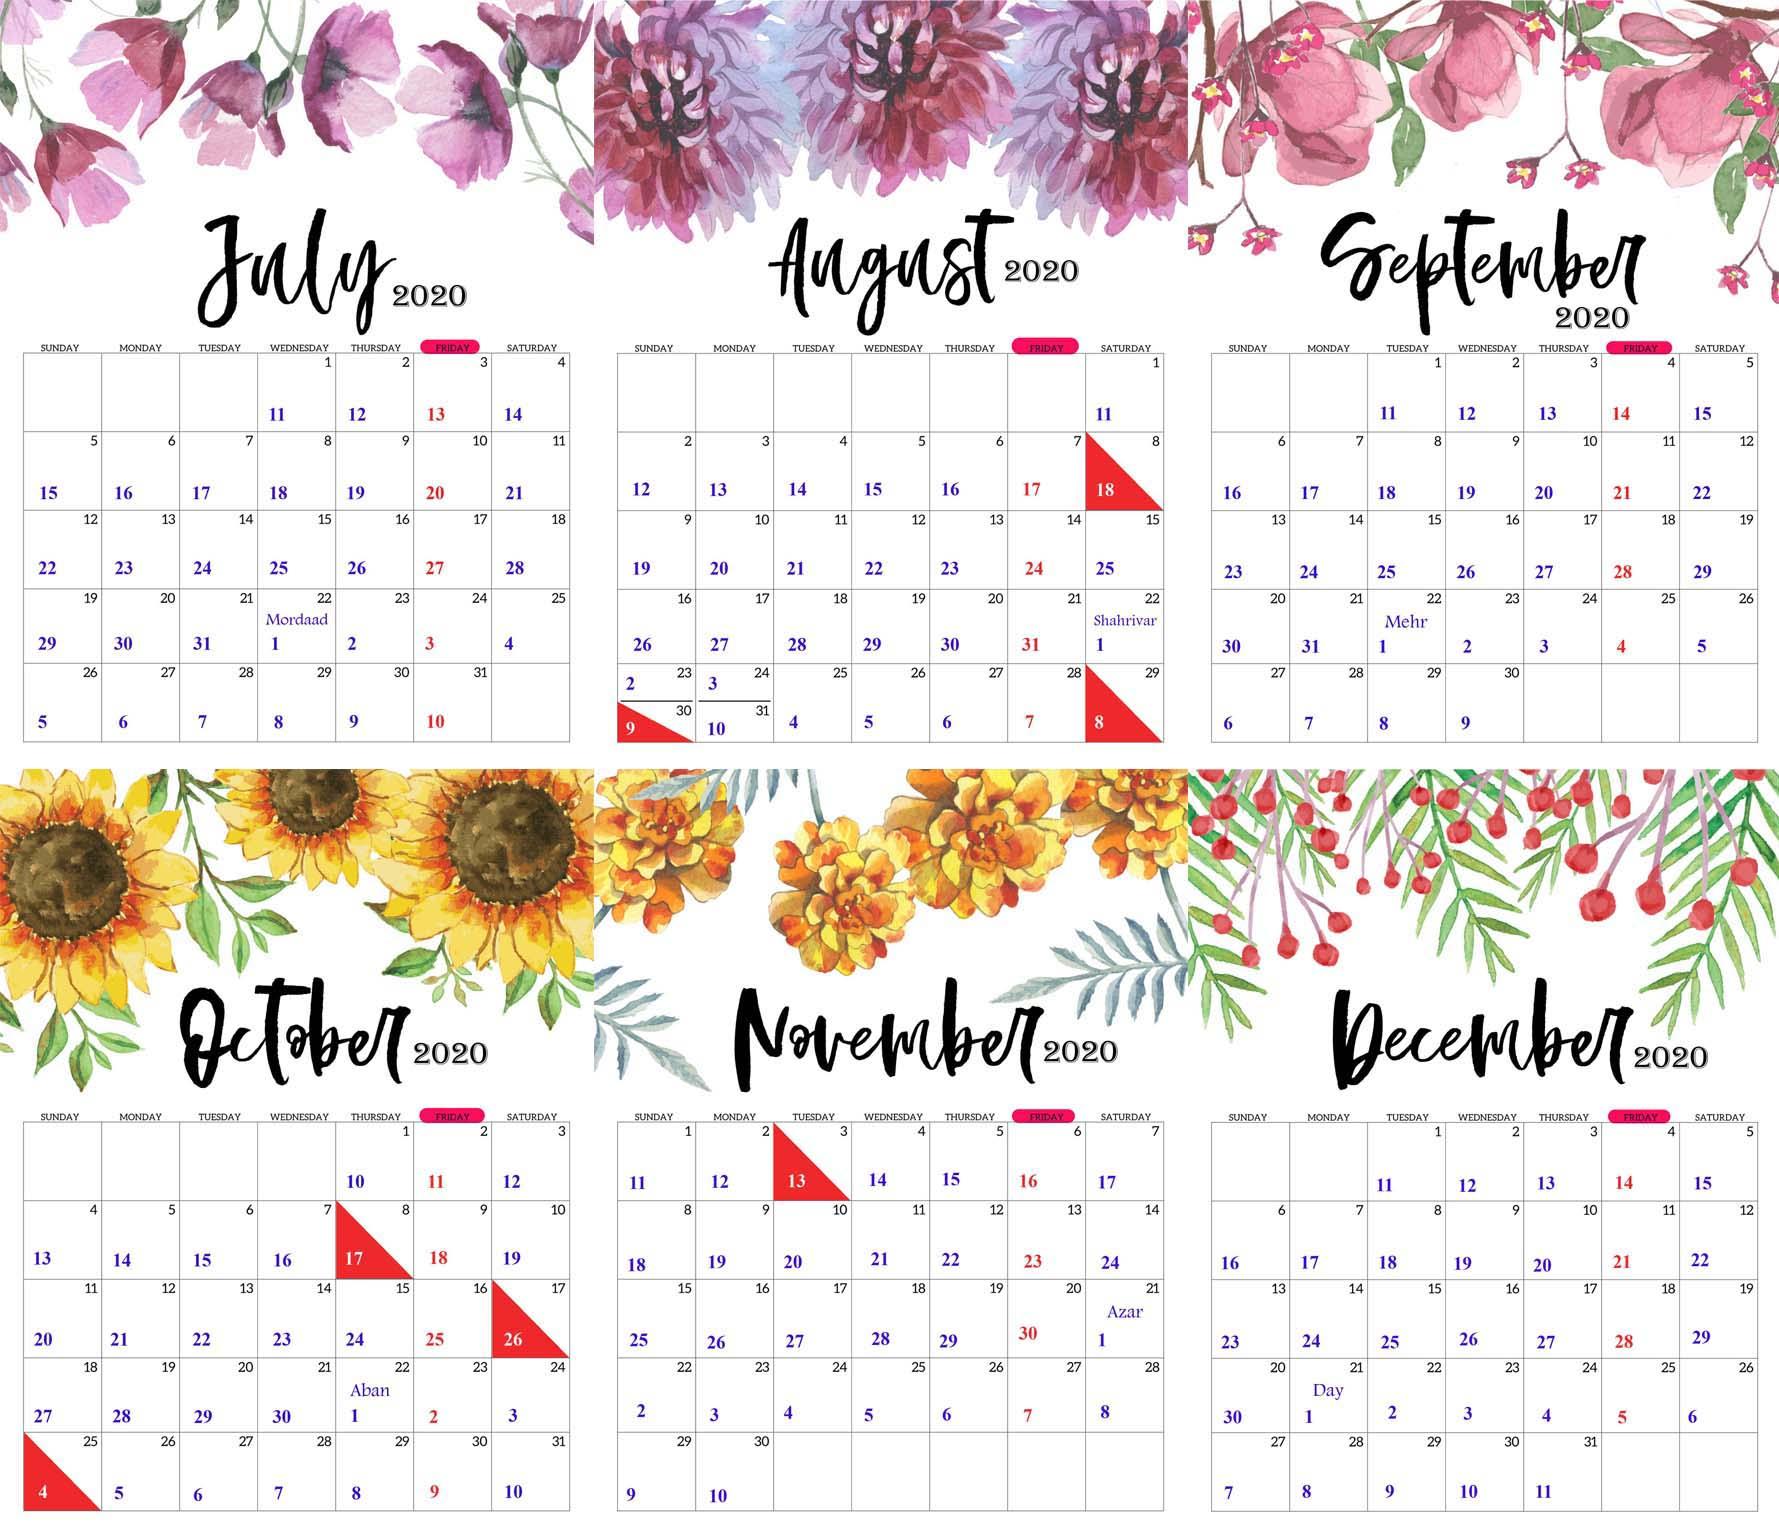 Persian Calendar, A Solar Hijri Calendar  Julian Dates And With Regard To Julian Vs Gregorian Calendar 2021